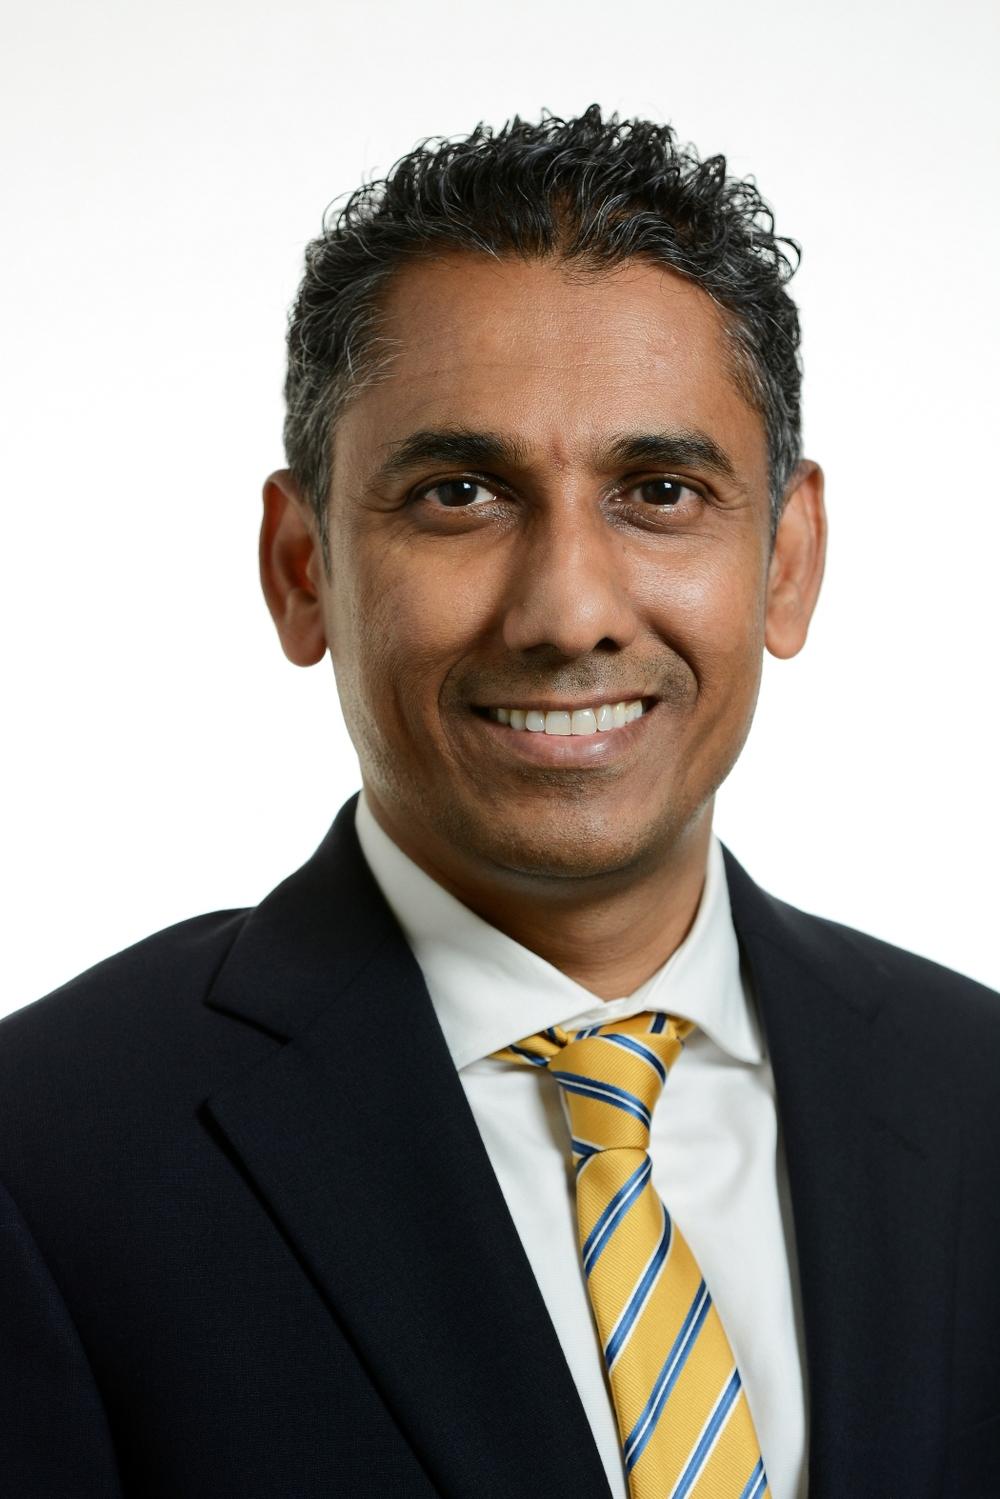 Mr. Raja Mohamad, Managing Director